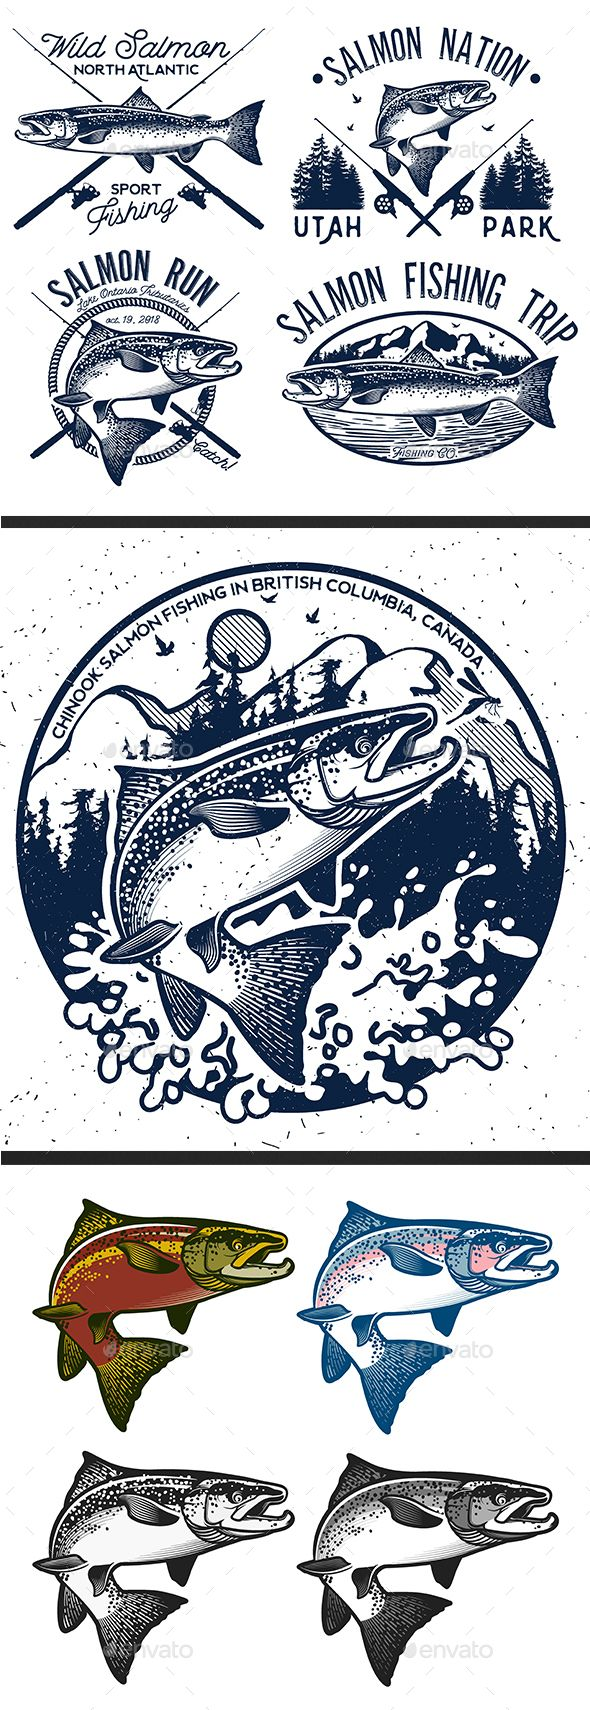 Vintage Salmon Fishing Emblem. Set 2 - Animals Characters